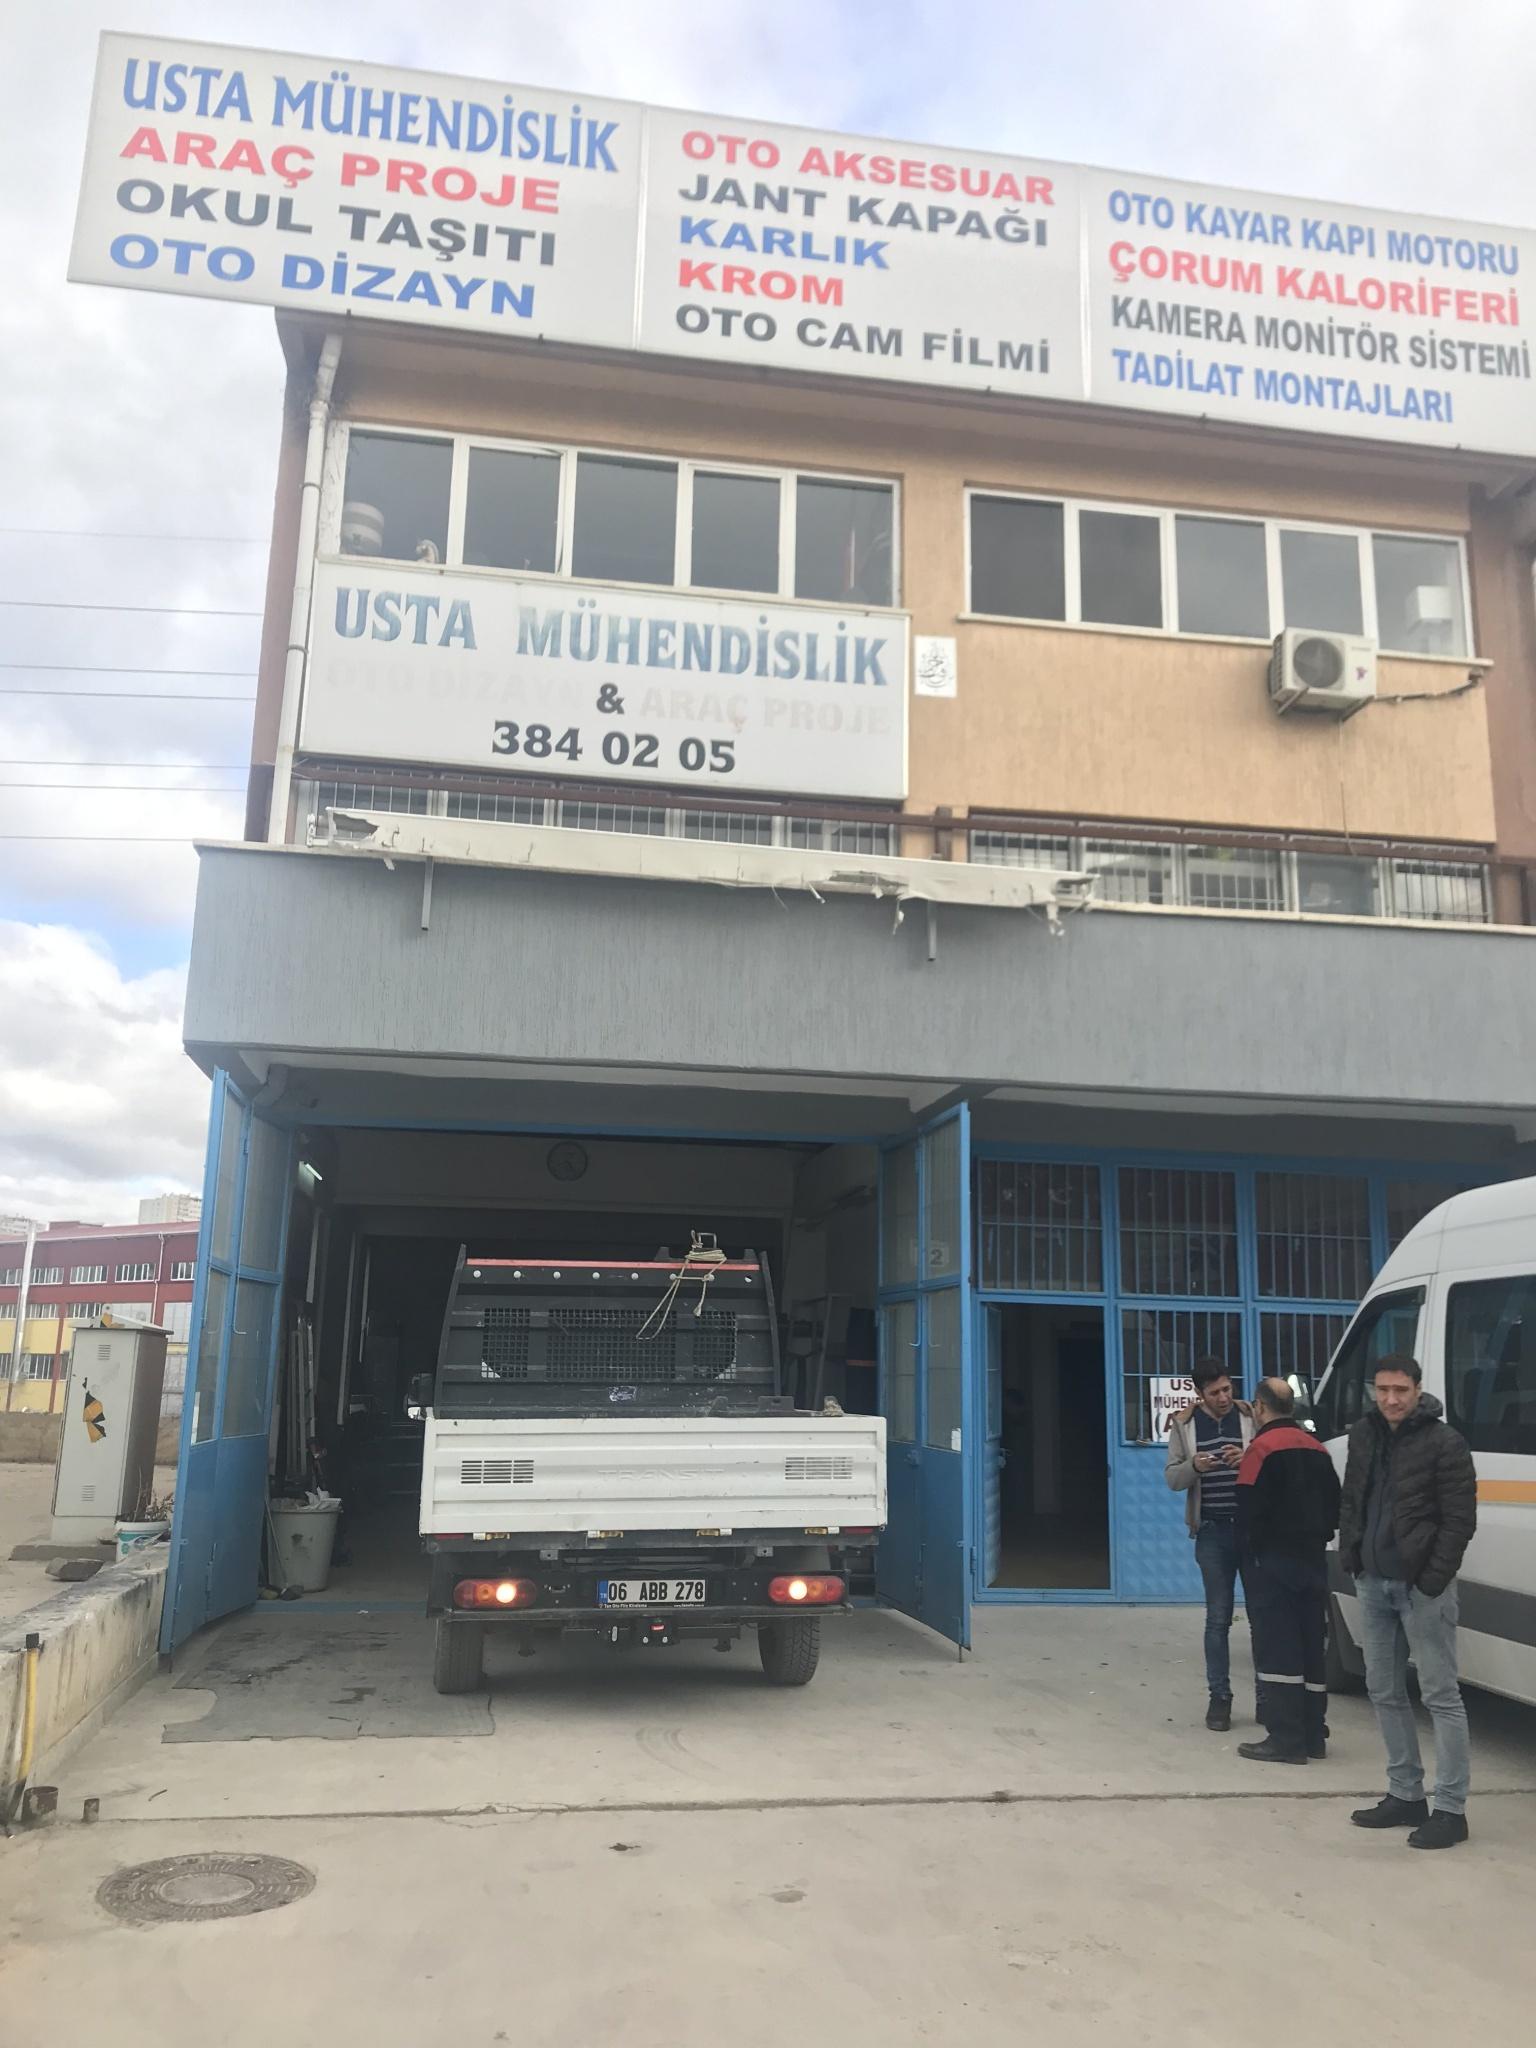 FORD TRANSİT  ÇEKİ DEMİRİ TAKMA MONTAJI ANKARA